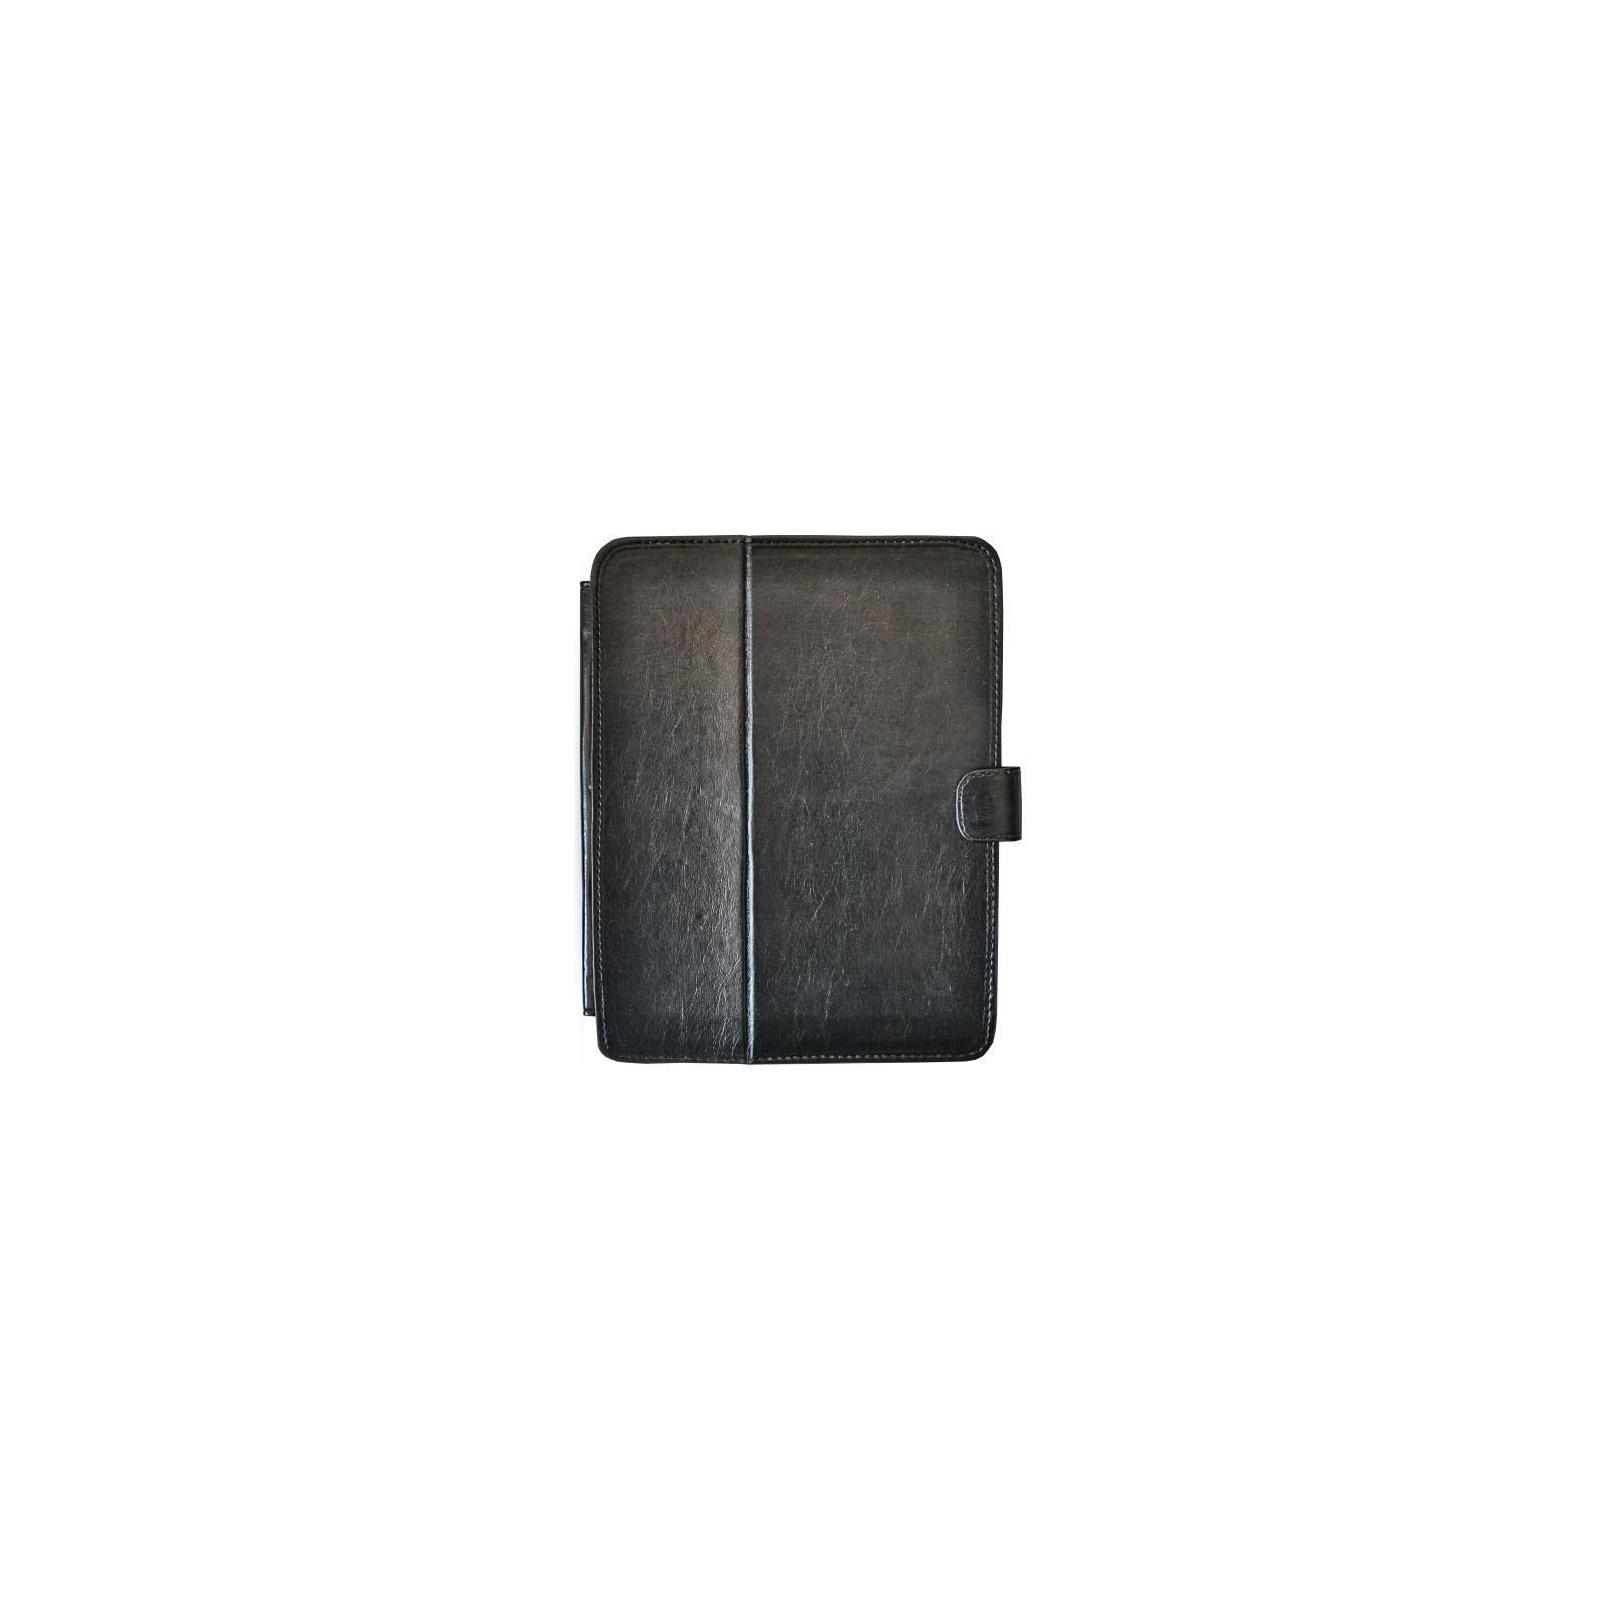 Чехол для планшета Vento 9.7 COOL - black